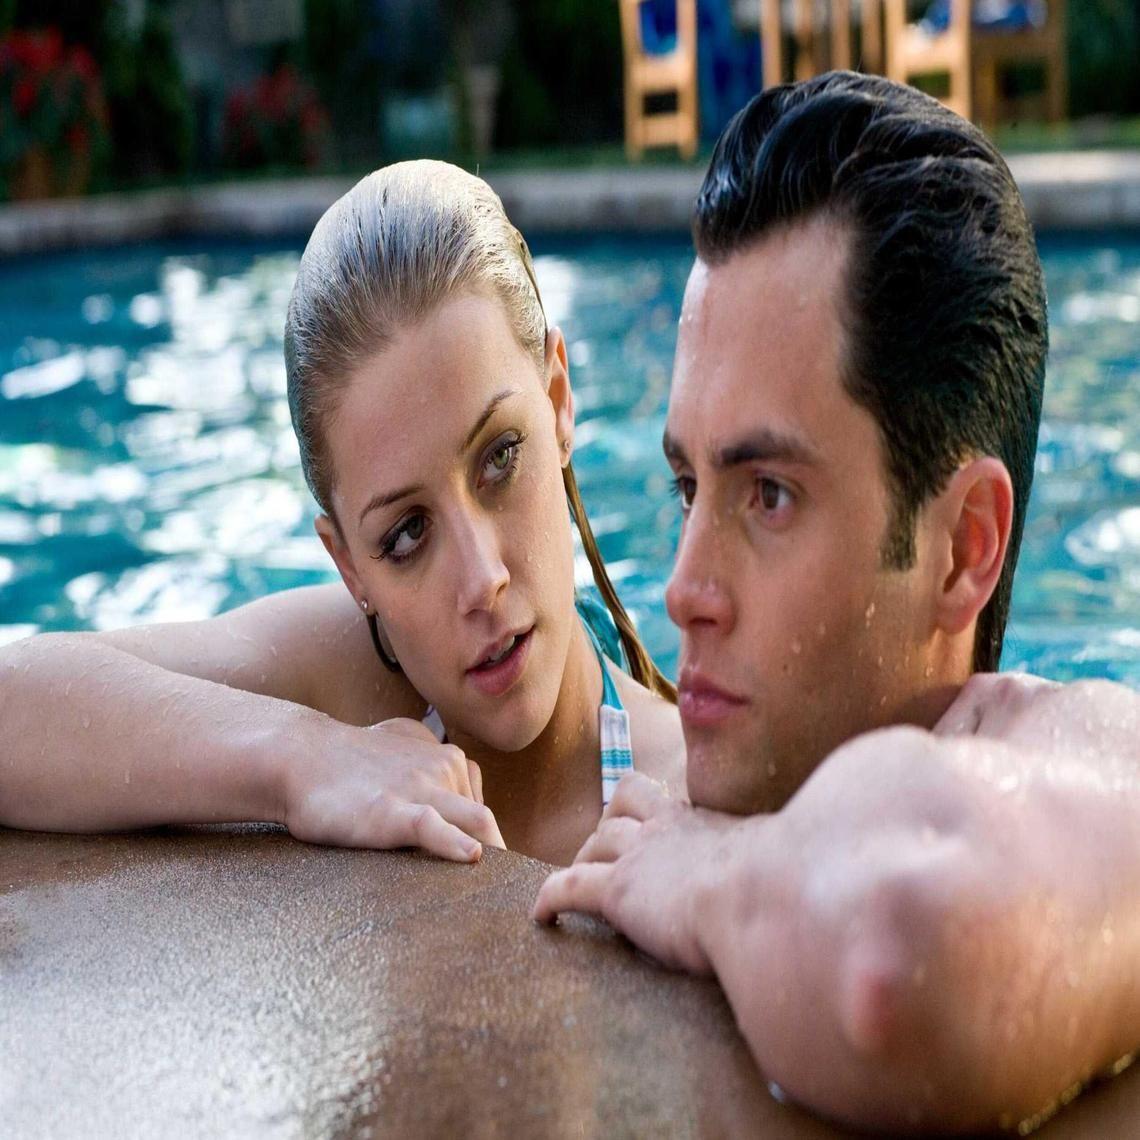 The Stepfather Amber Heard In Pool Amber Heard Amber Heard Photos Amber Heard Movies